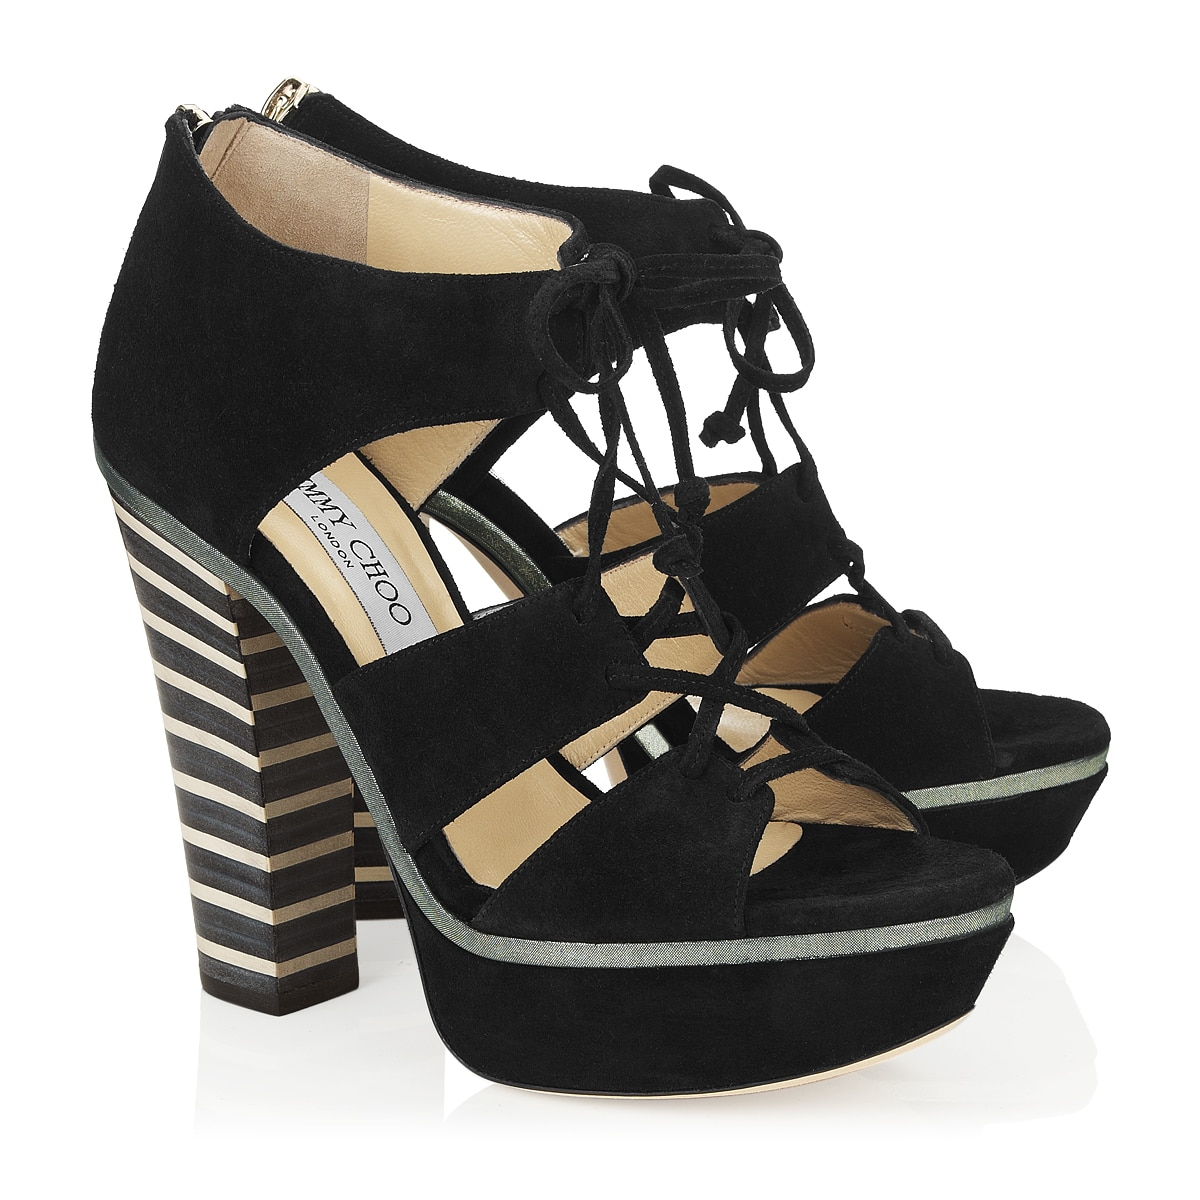 Jimmy Choo Sandals 2014